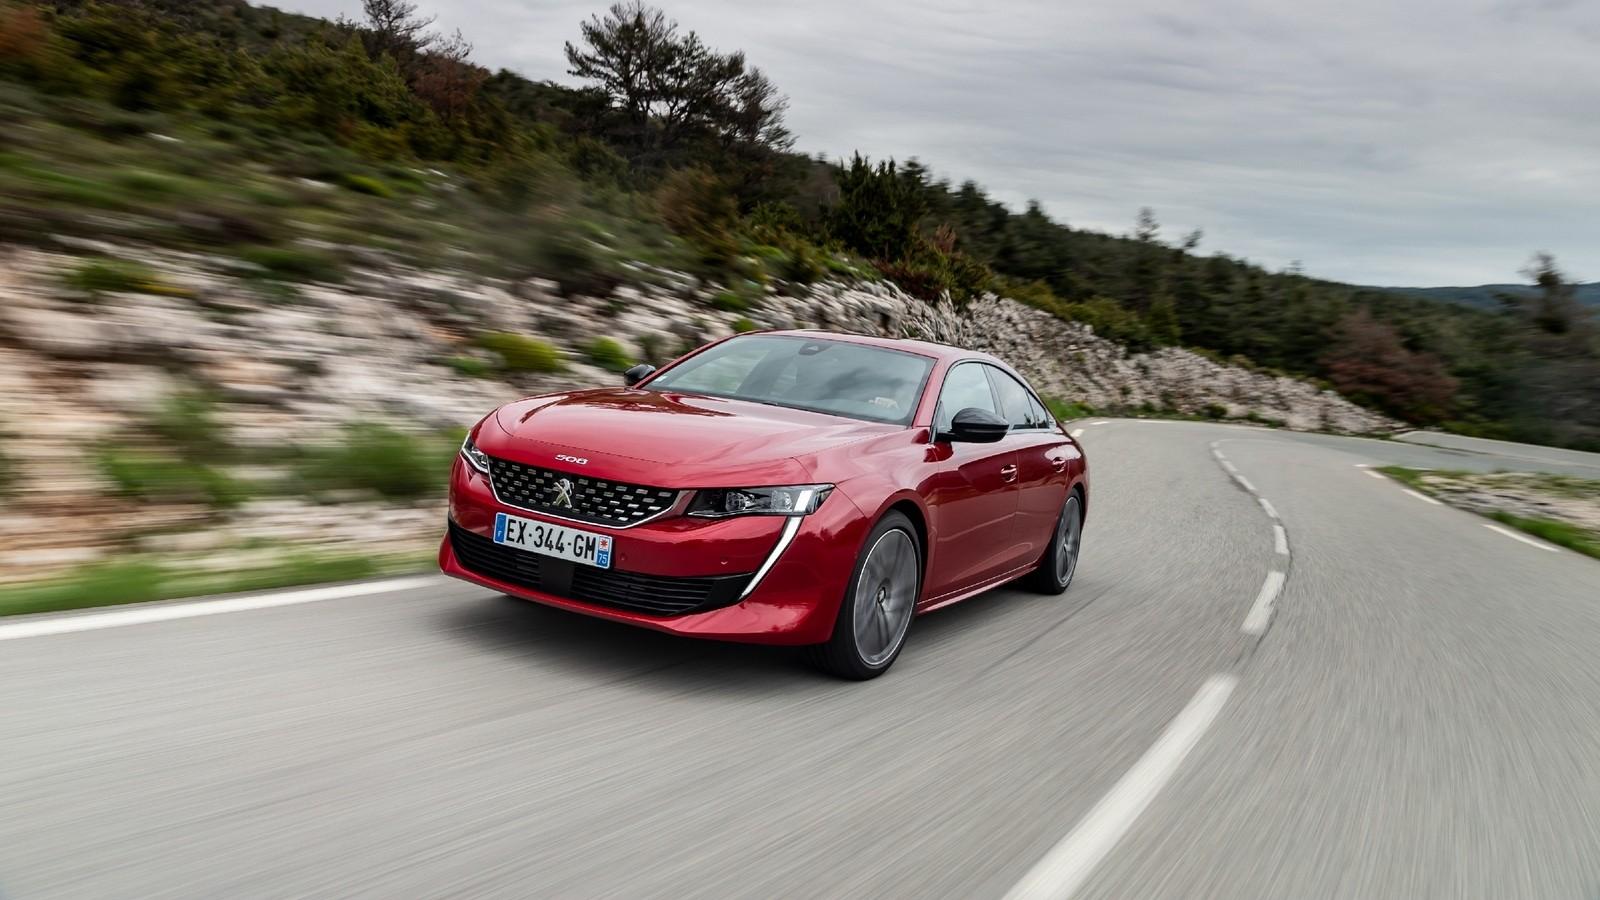 Peugeot 508 красная на трассе